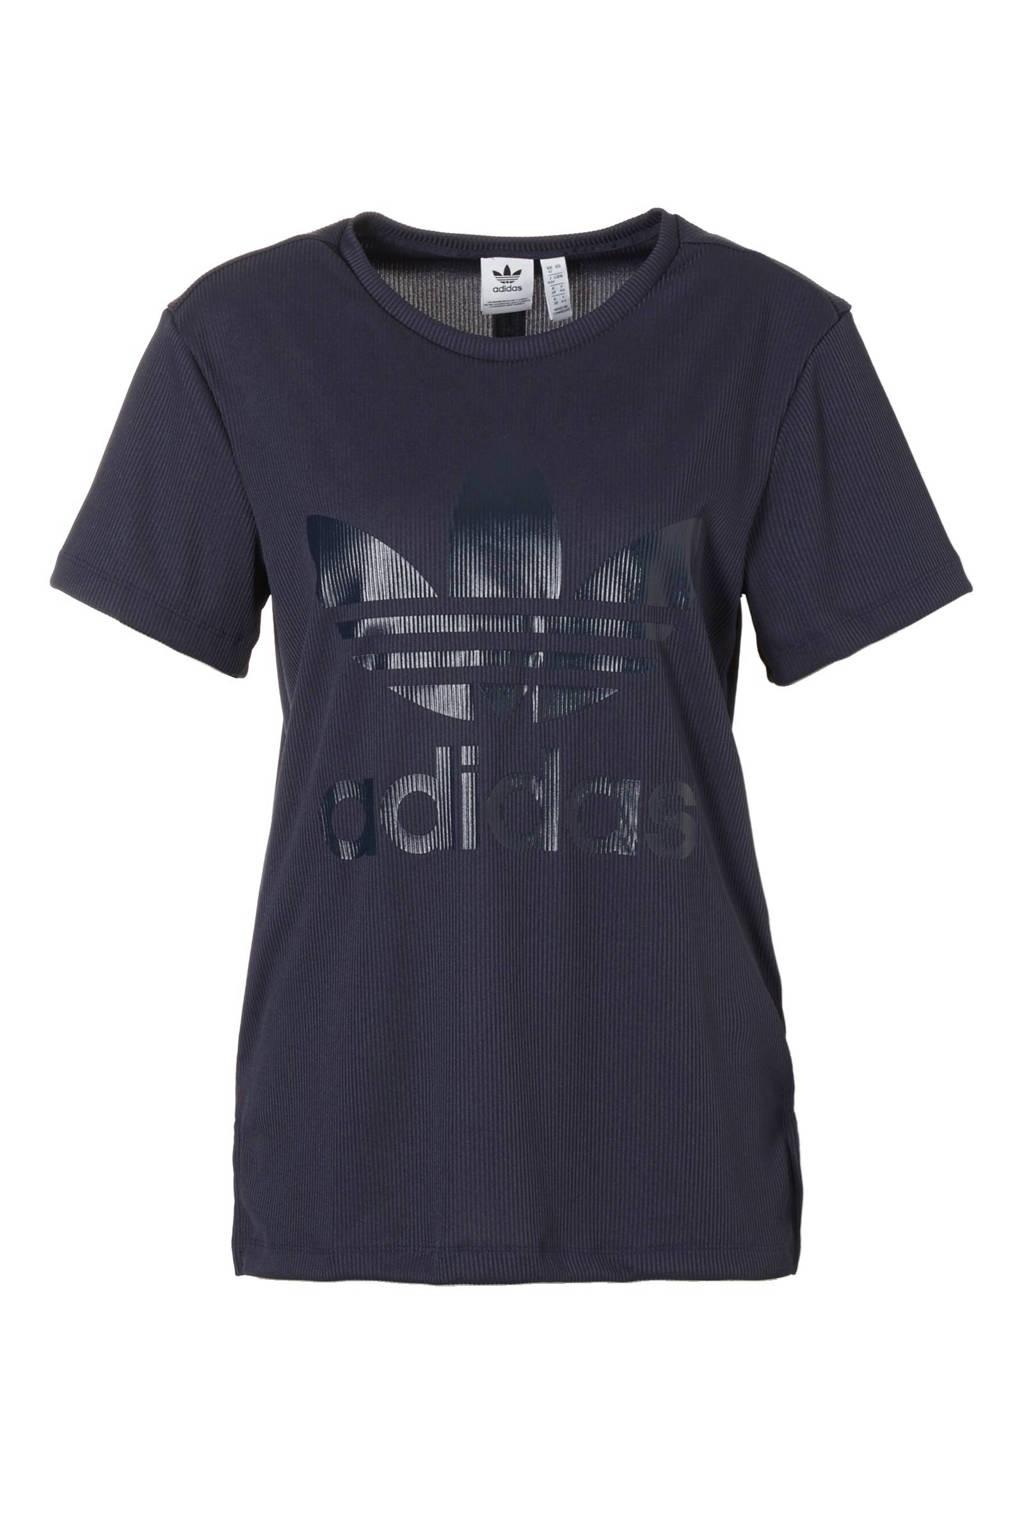 455f5a4ecae adidas originals T-shirt, Donkerblauw/wit